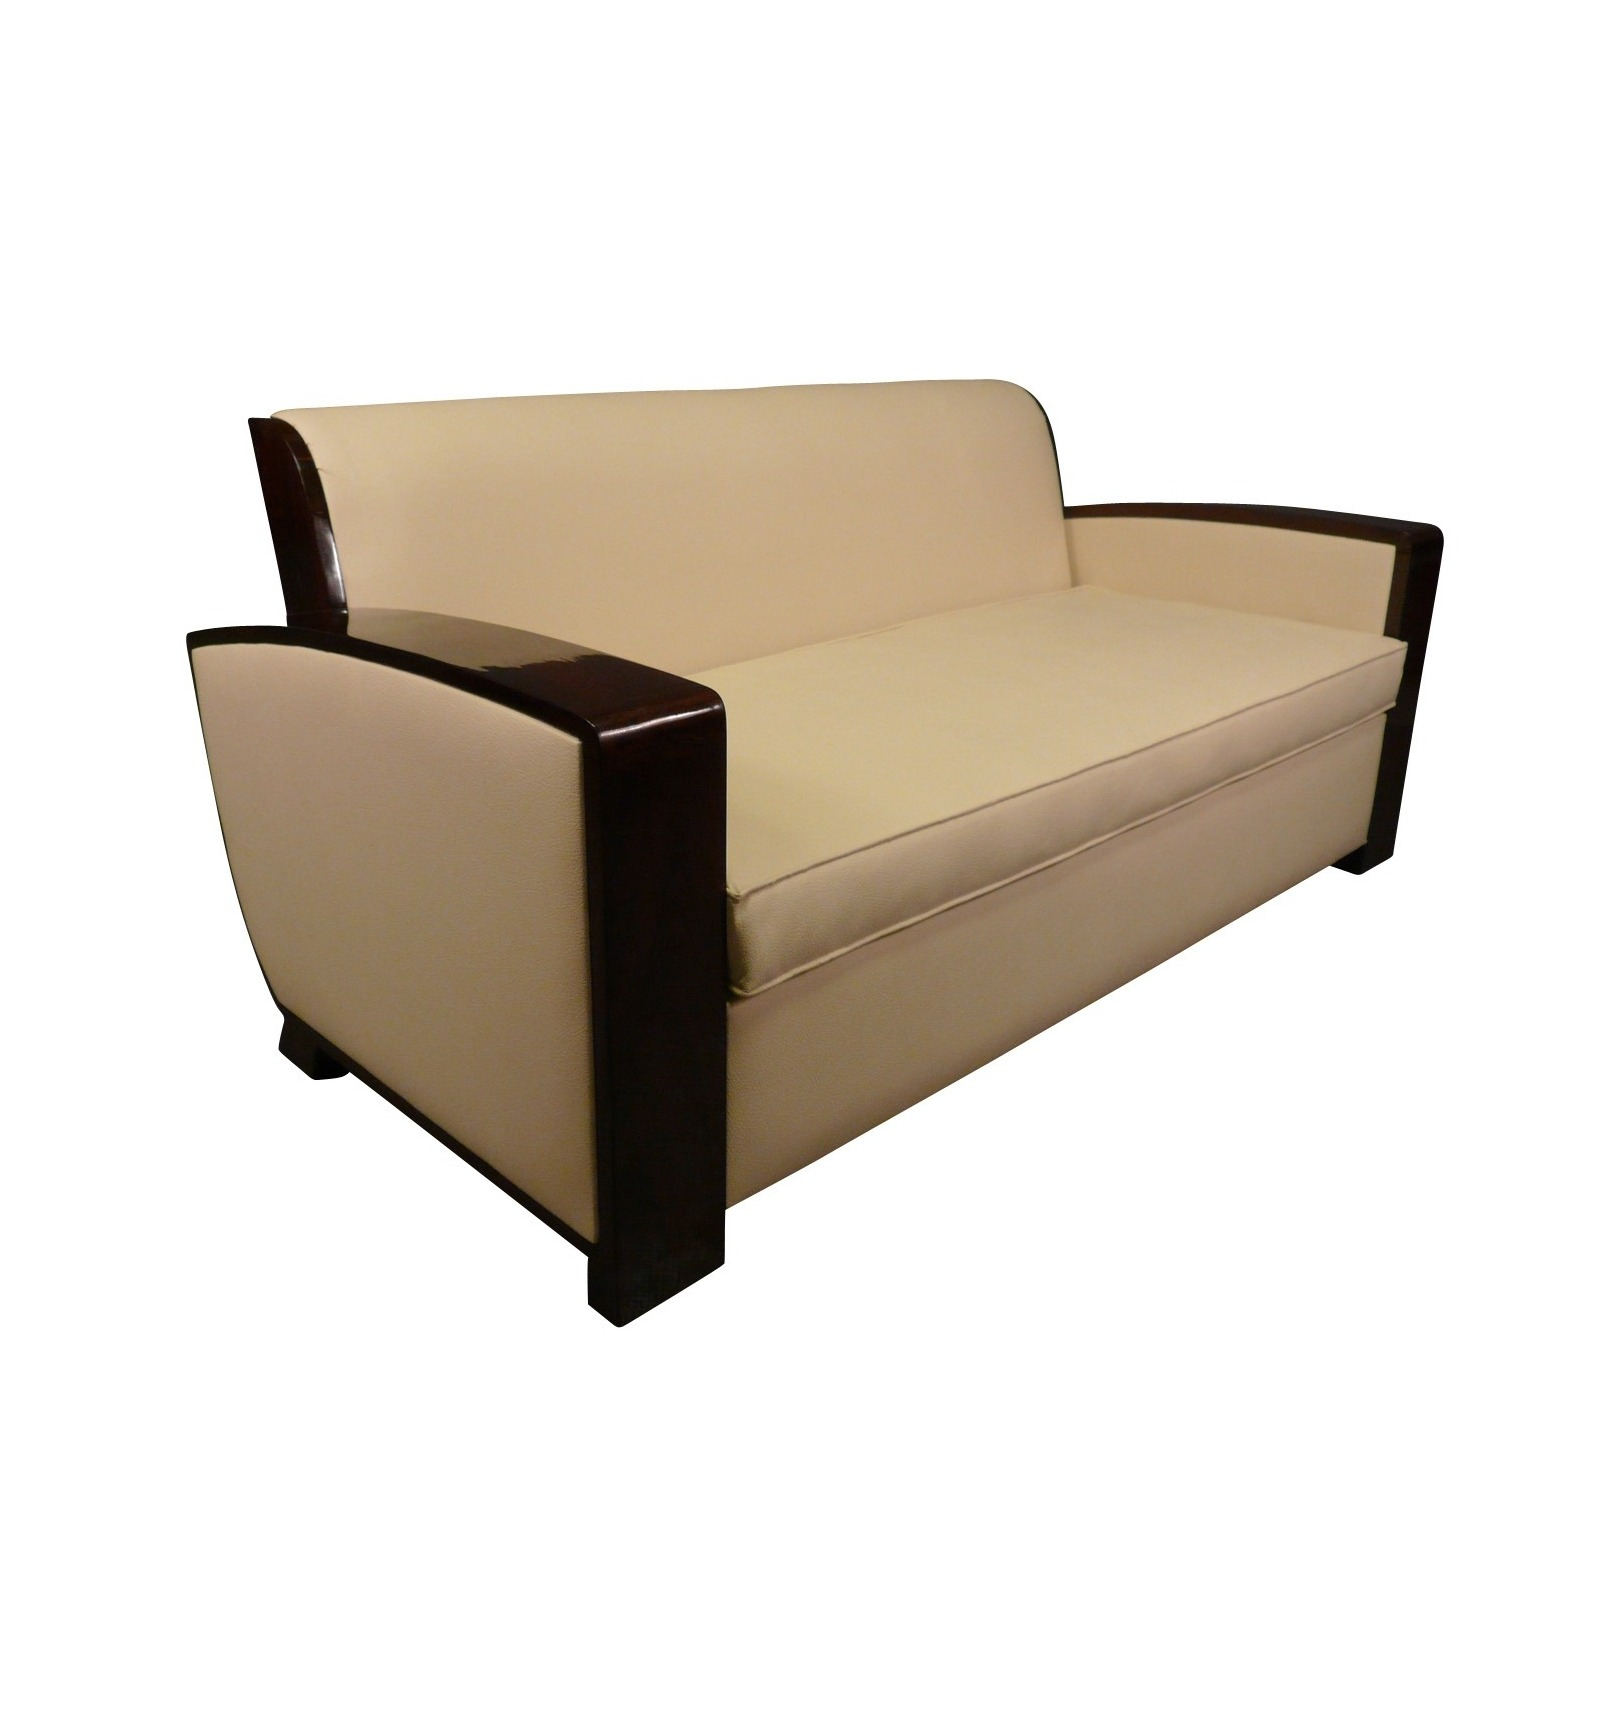 Sofa art deco paris art deco m bel Hundeurin aus sofa entfernen